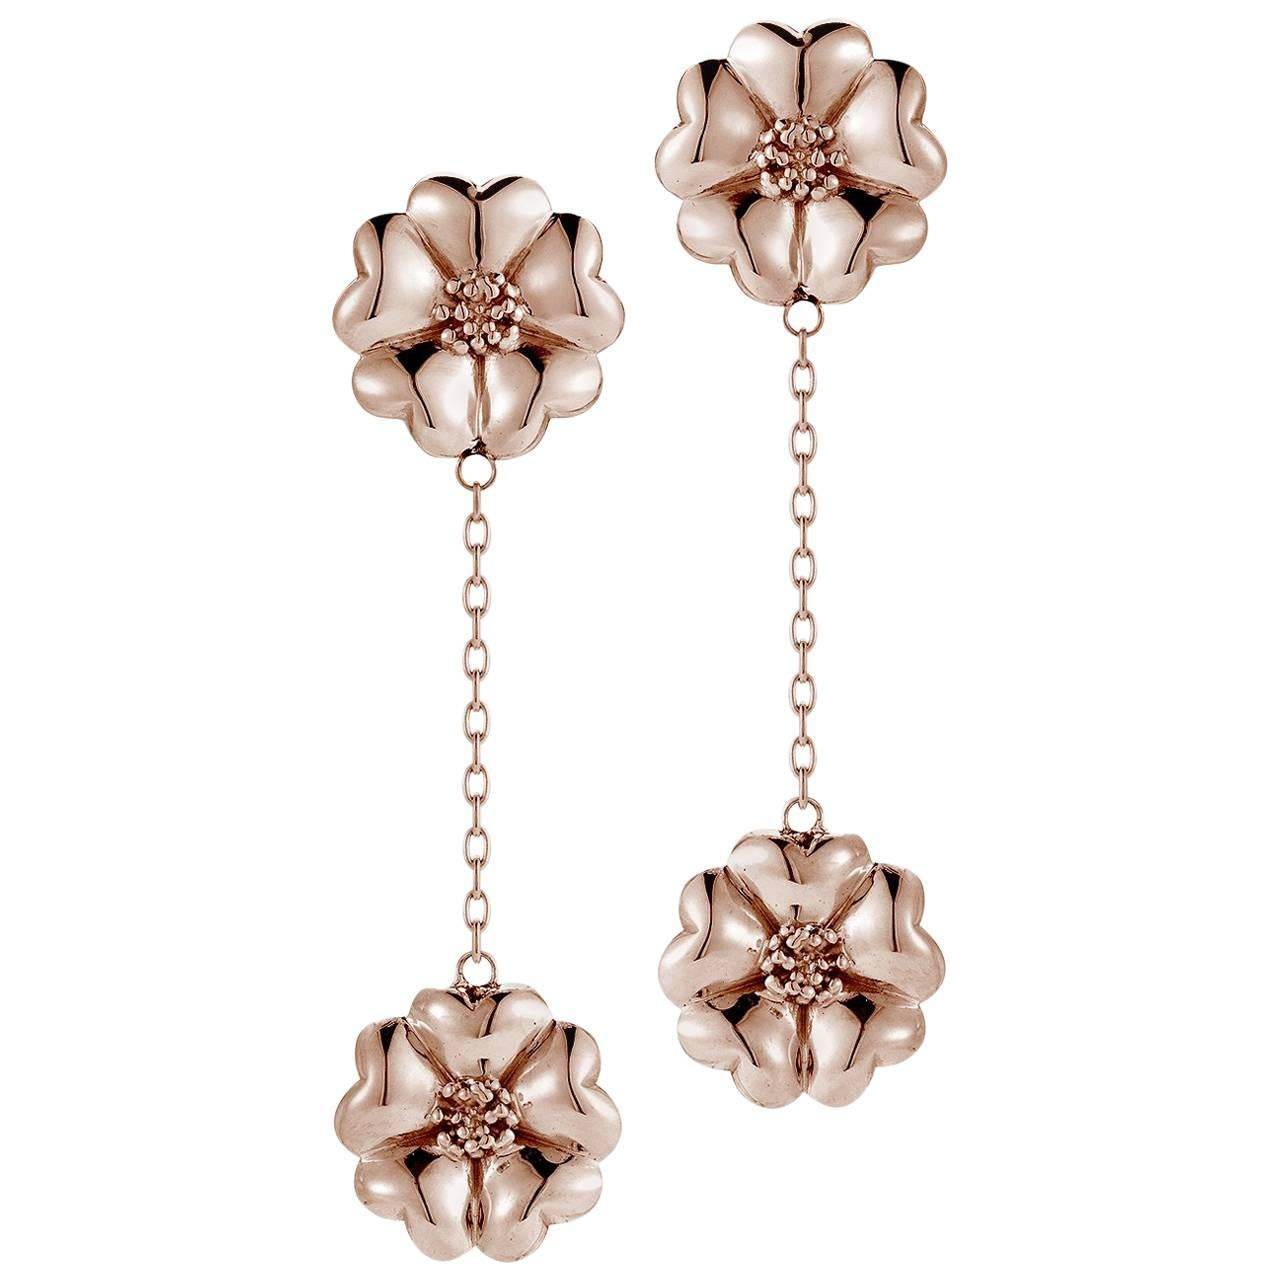 24k Rose Gold Vermeil Double Blossom Chain Drop Earrings